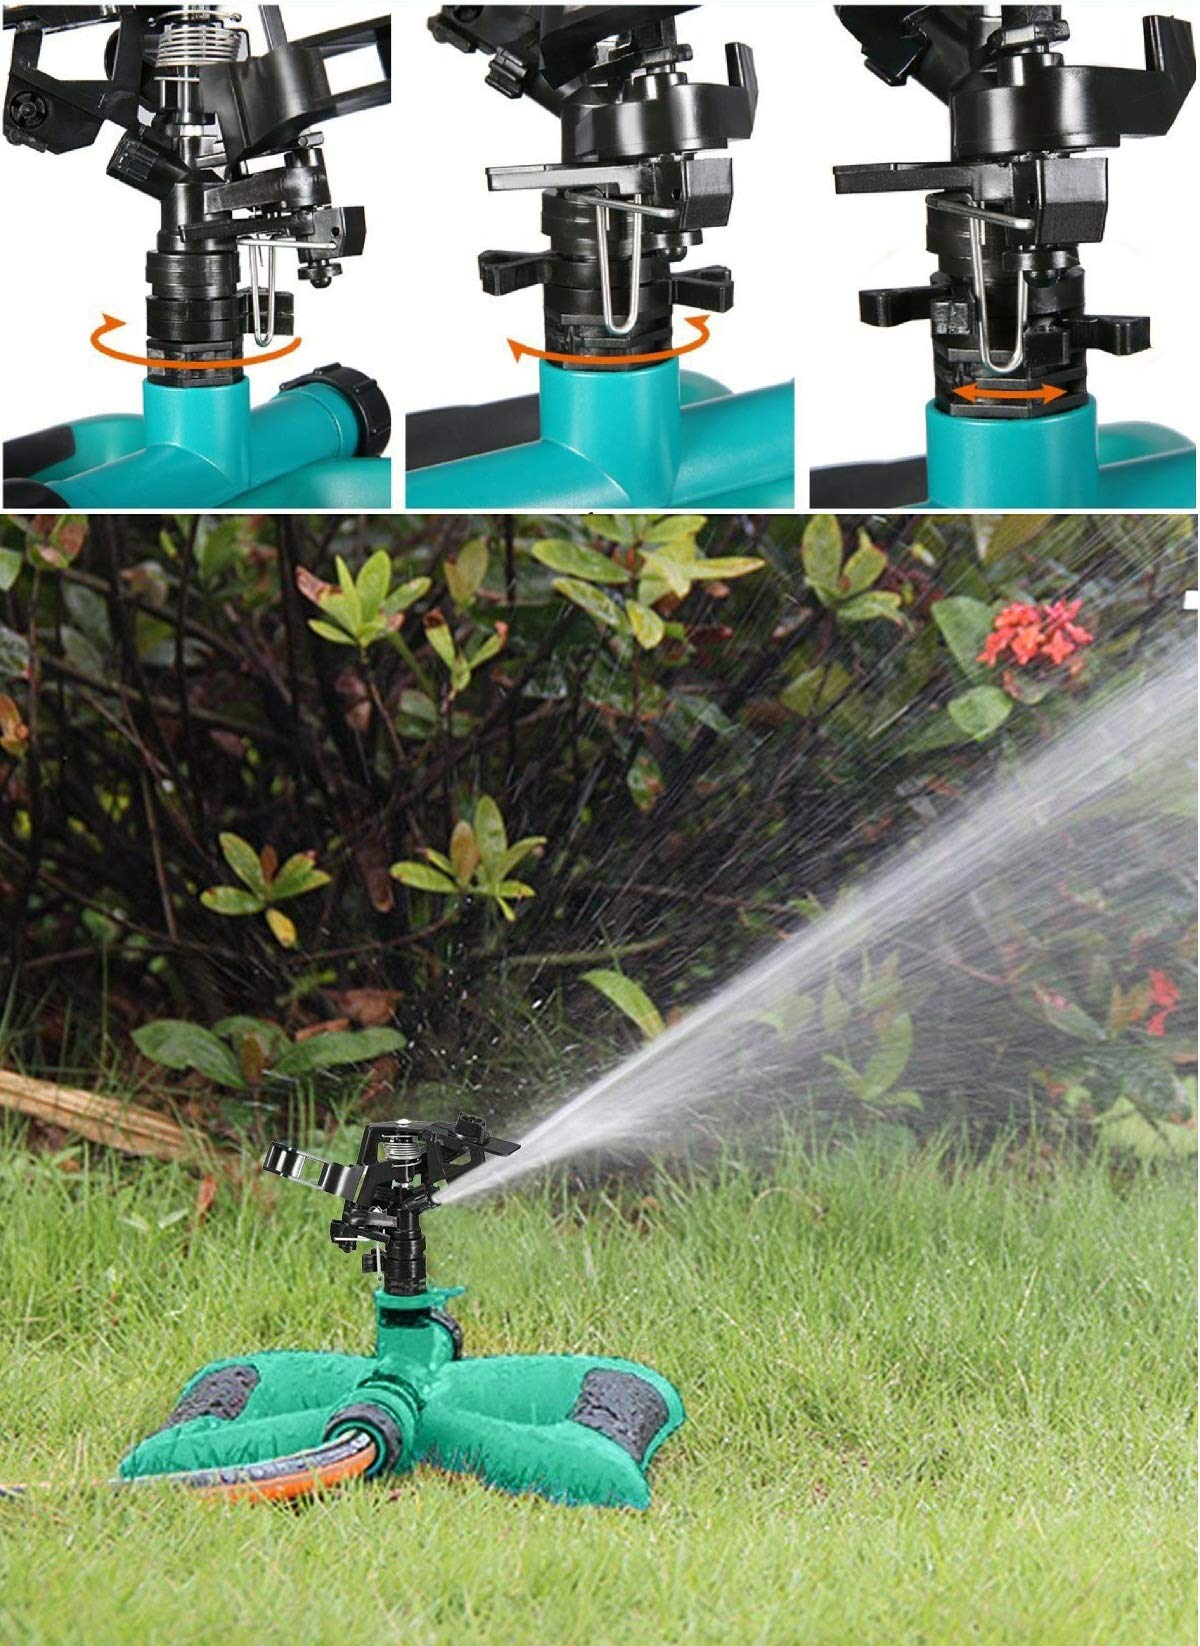 ALLESCOOL Garden Sprinkler, 360° Fully Circle Rotating Water Sprinkler Garden Pipe Hose Irrigation, 2 Sprinkler Head for Gardens & Lawns Irrigation